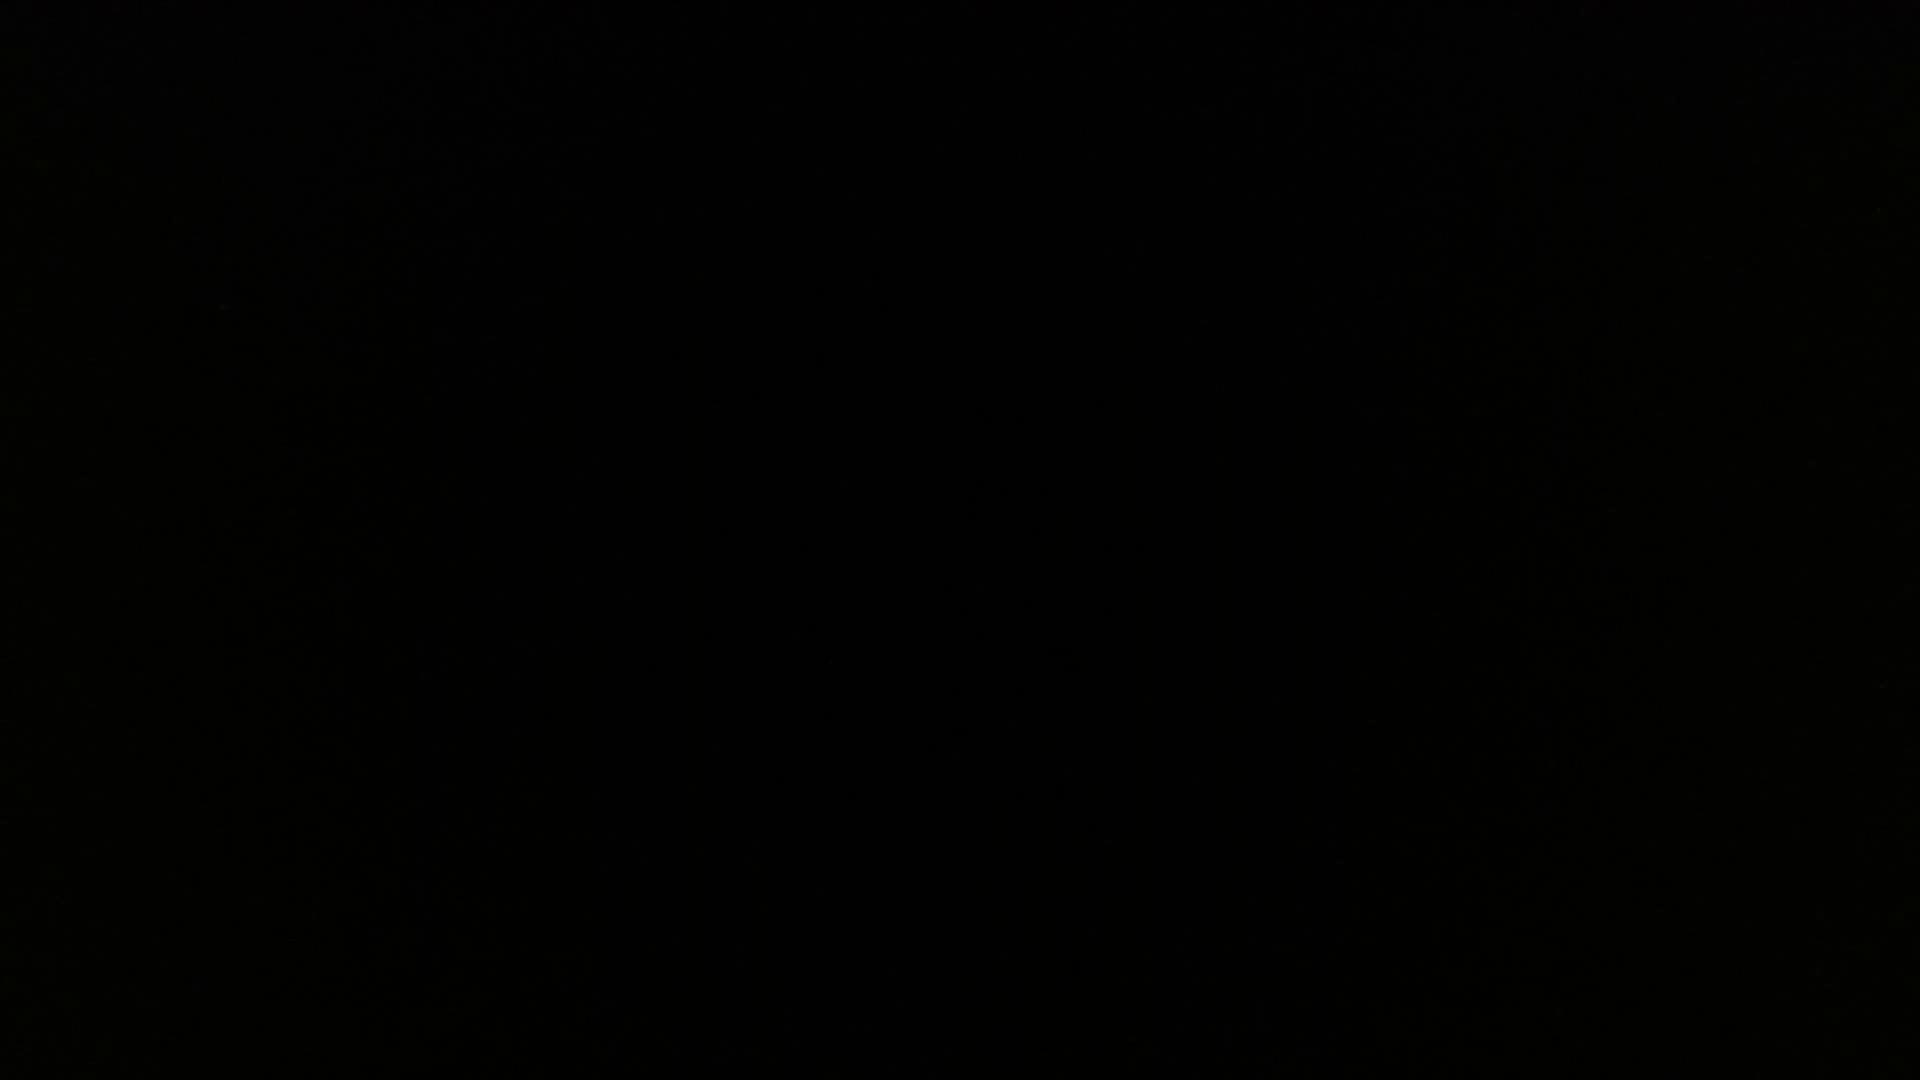 SPYさん初投稿!マンション覗き!5000K!ハイビジョン撮影VOL.03(元野球部社会人編) 完全無修正  109pic 63